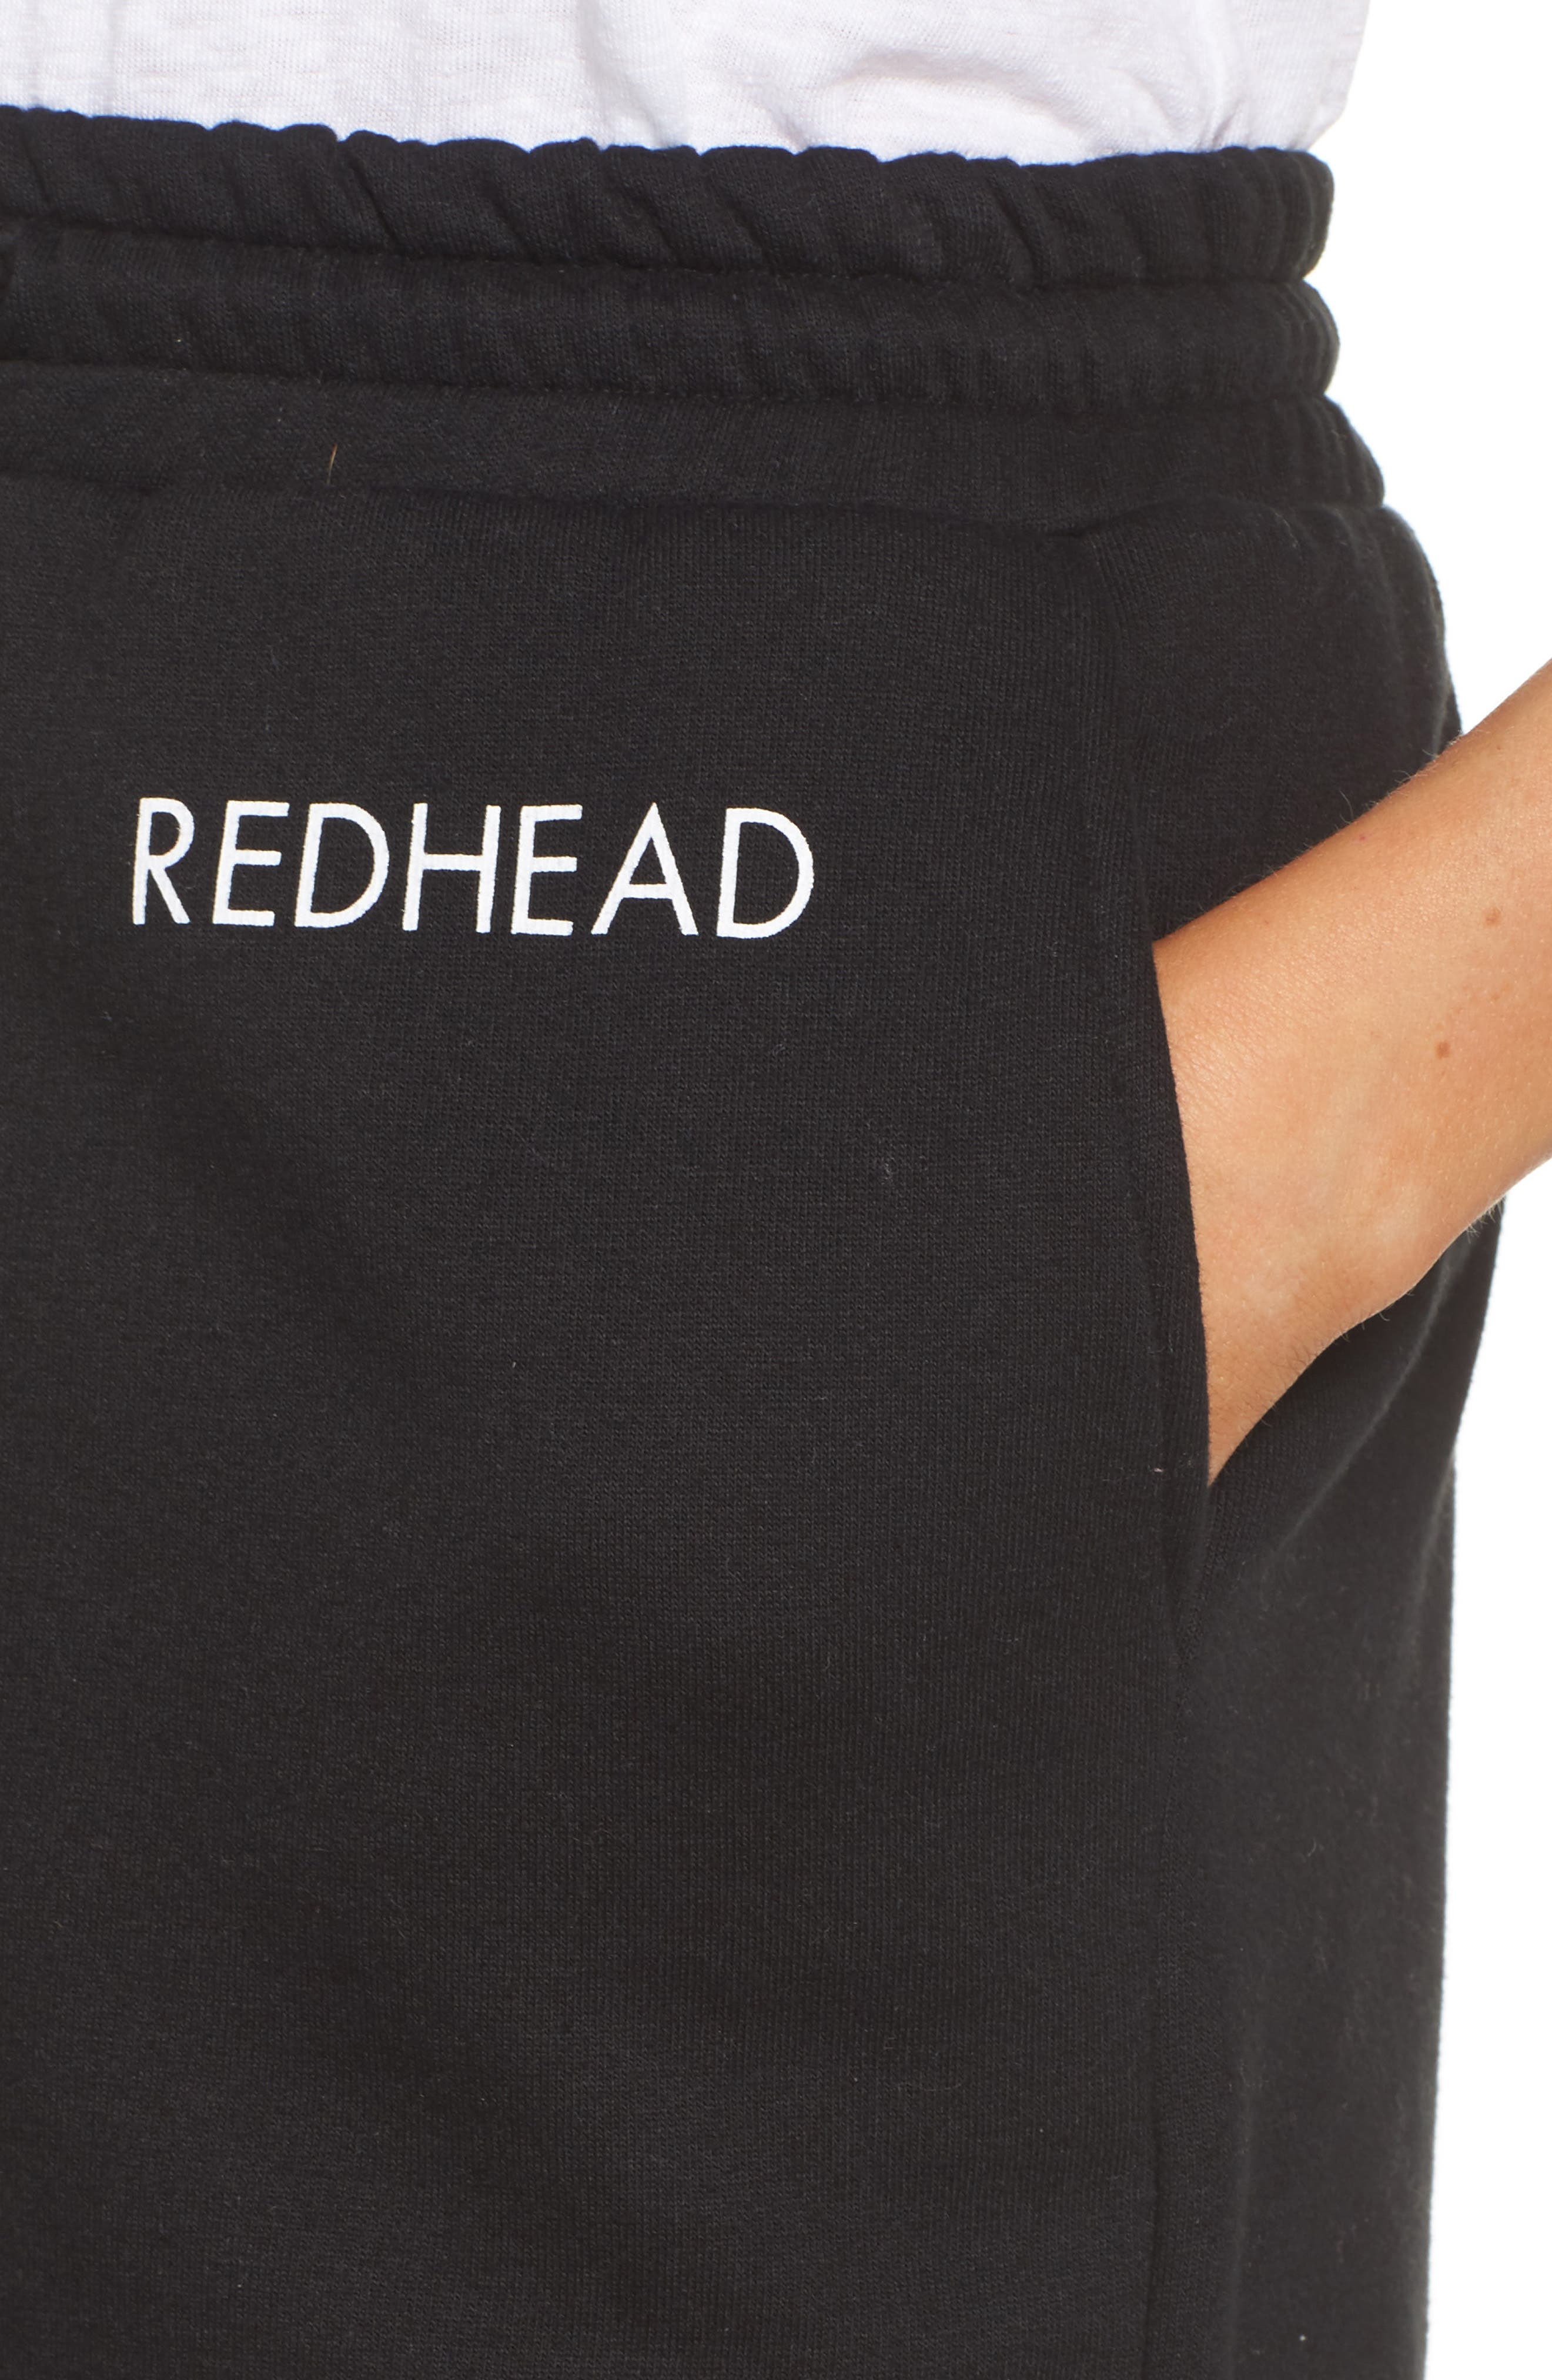 Redhead Shorts,                             Alternate thumbnail 4, color,                             010